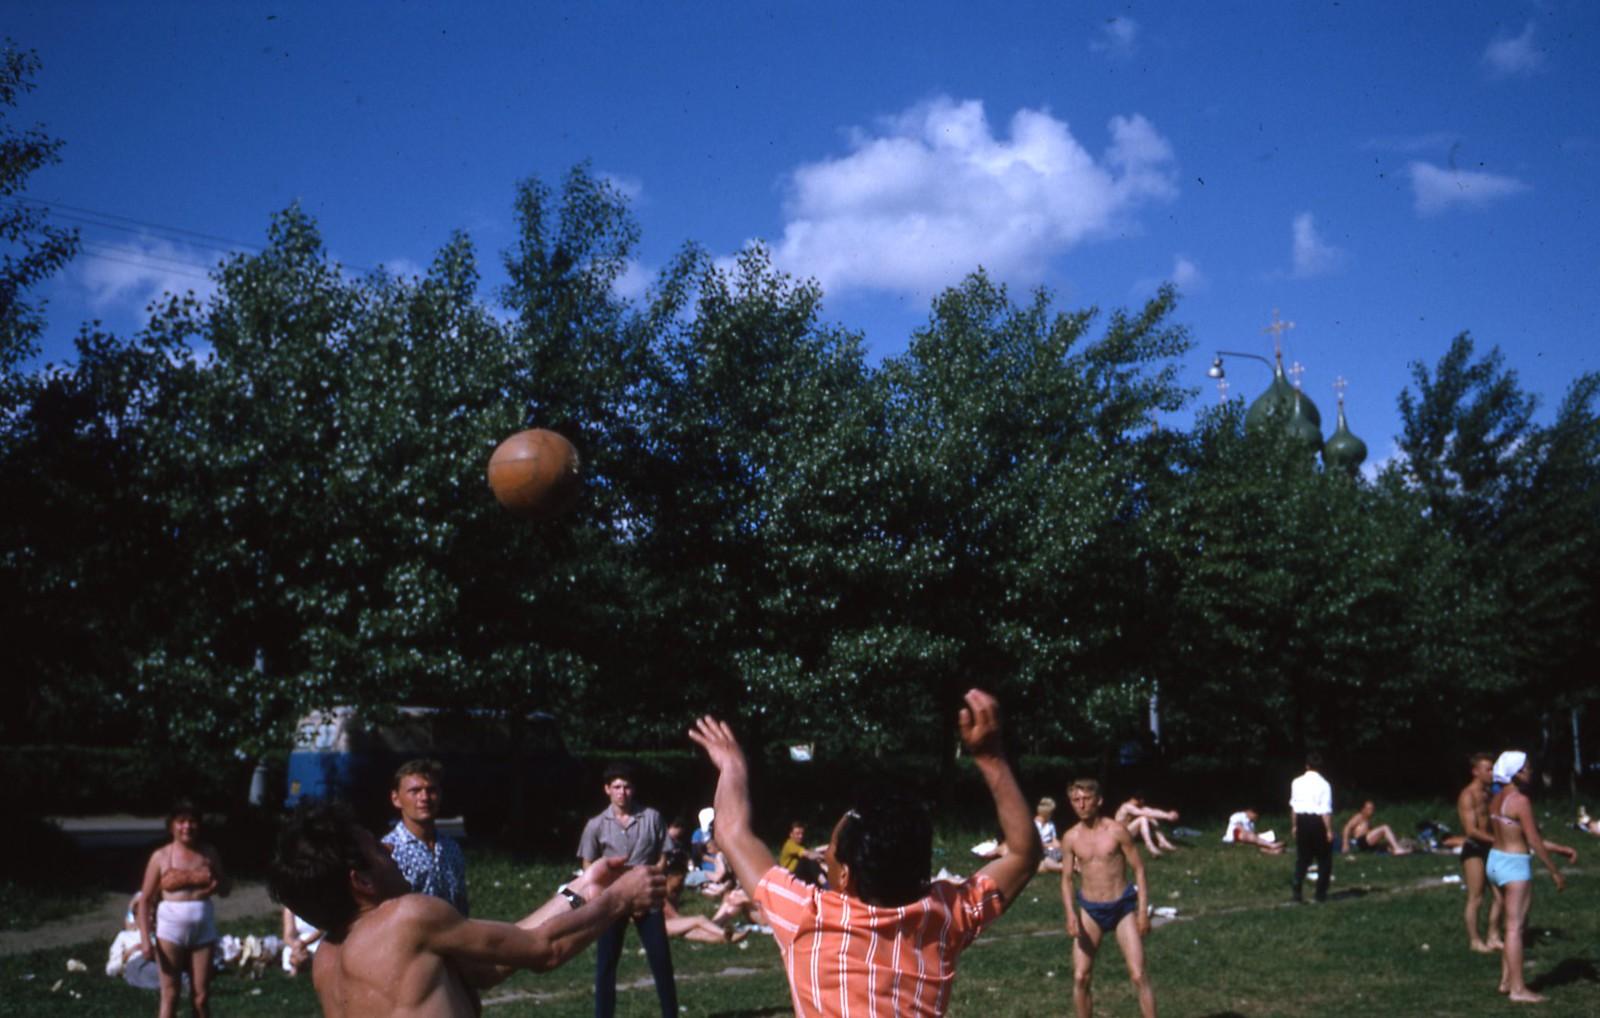 hammond-MA10-Ostankino-people-sunbathing-and-fishing-019